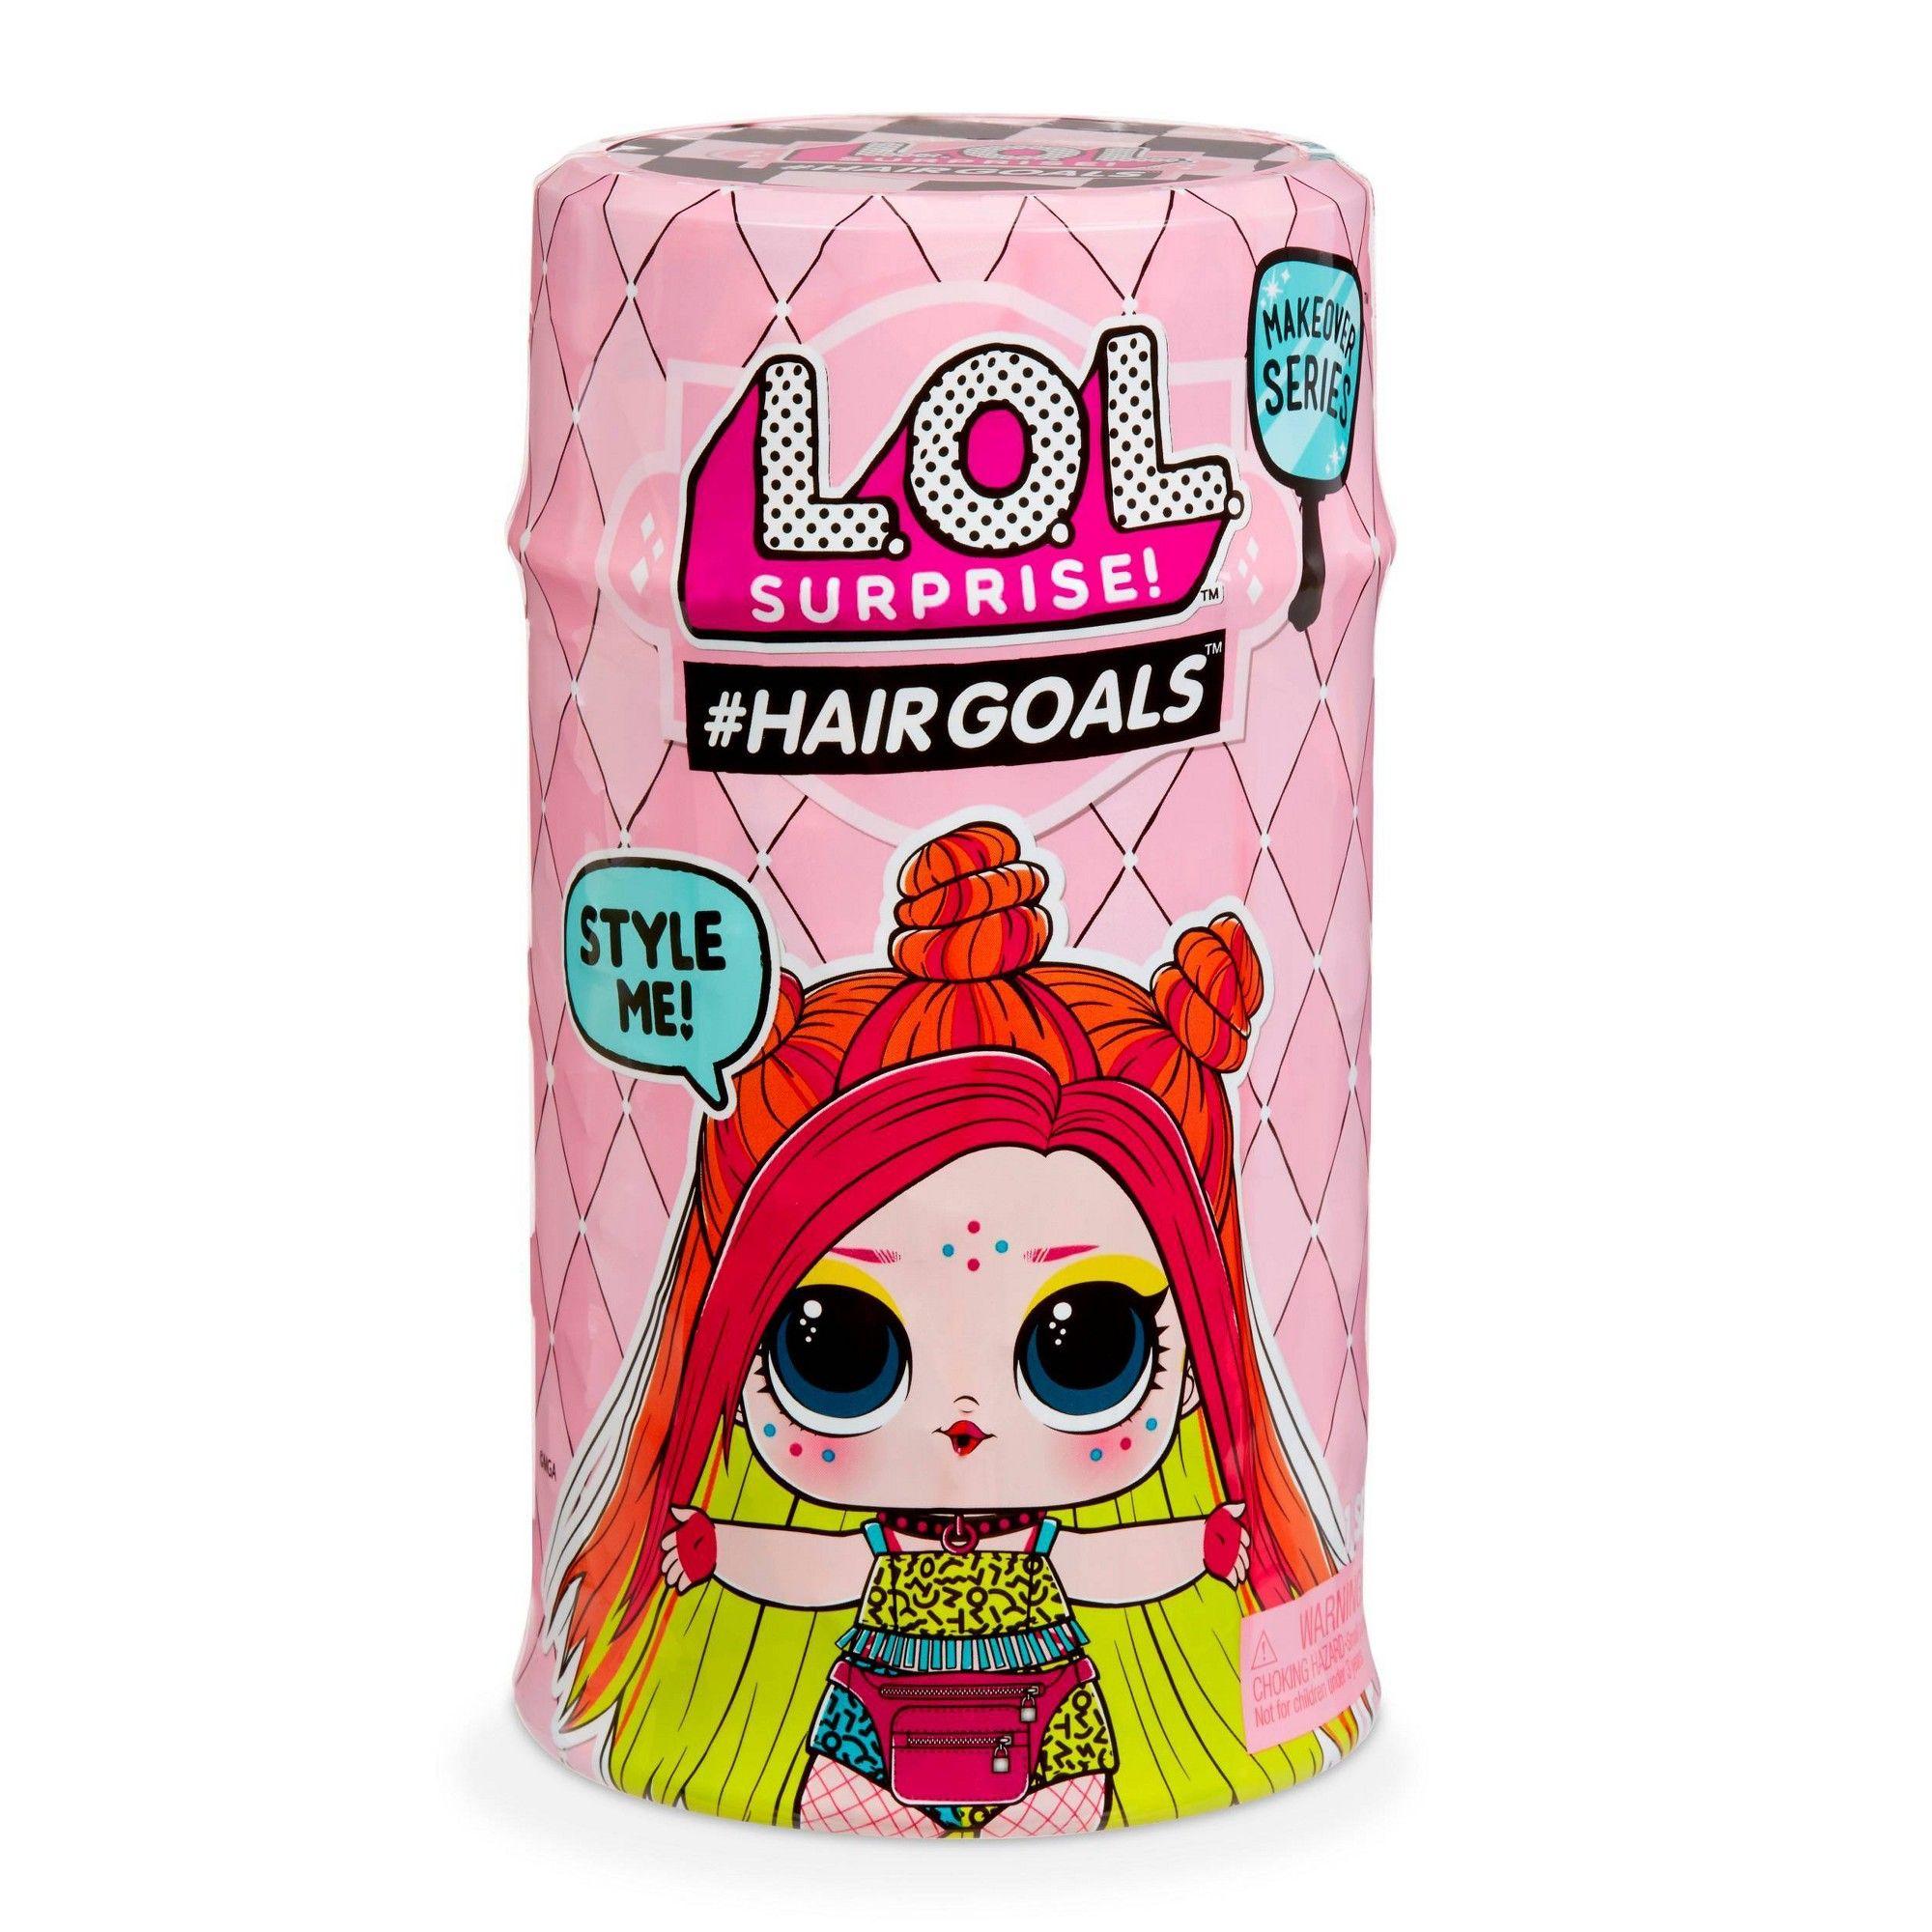 LOL Surprise #Hairgoals  Makeover Series Series 5 WAVE 2 Big  Doll 1 2 3 5 6